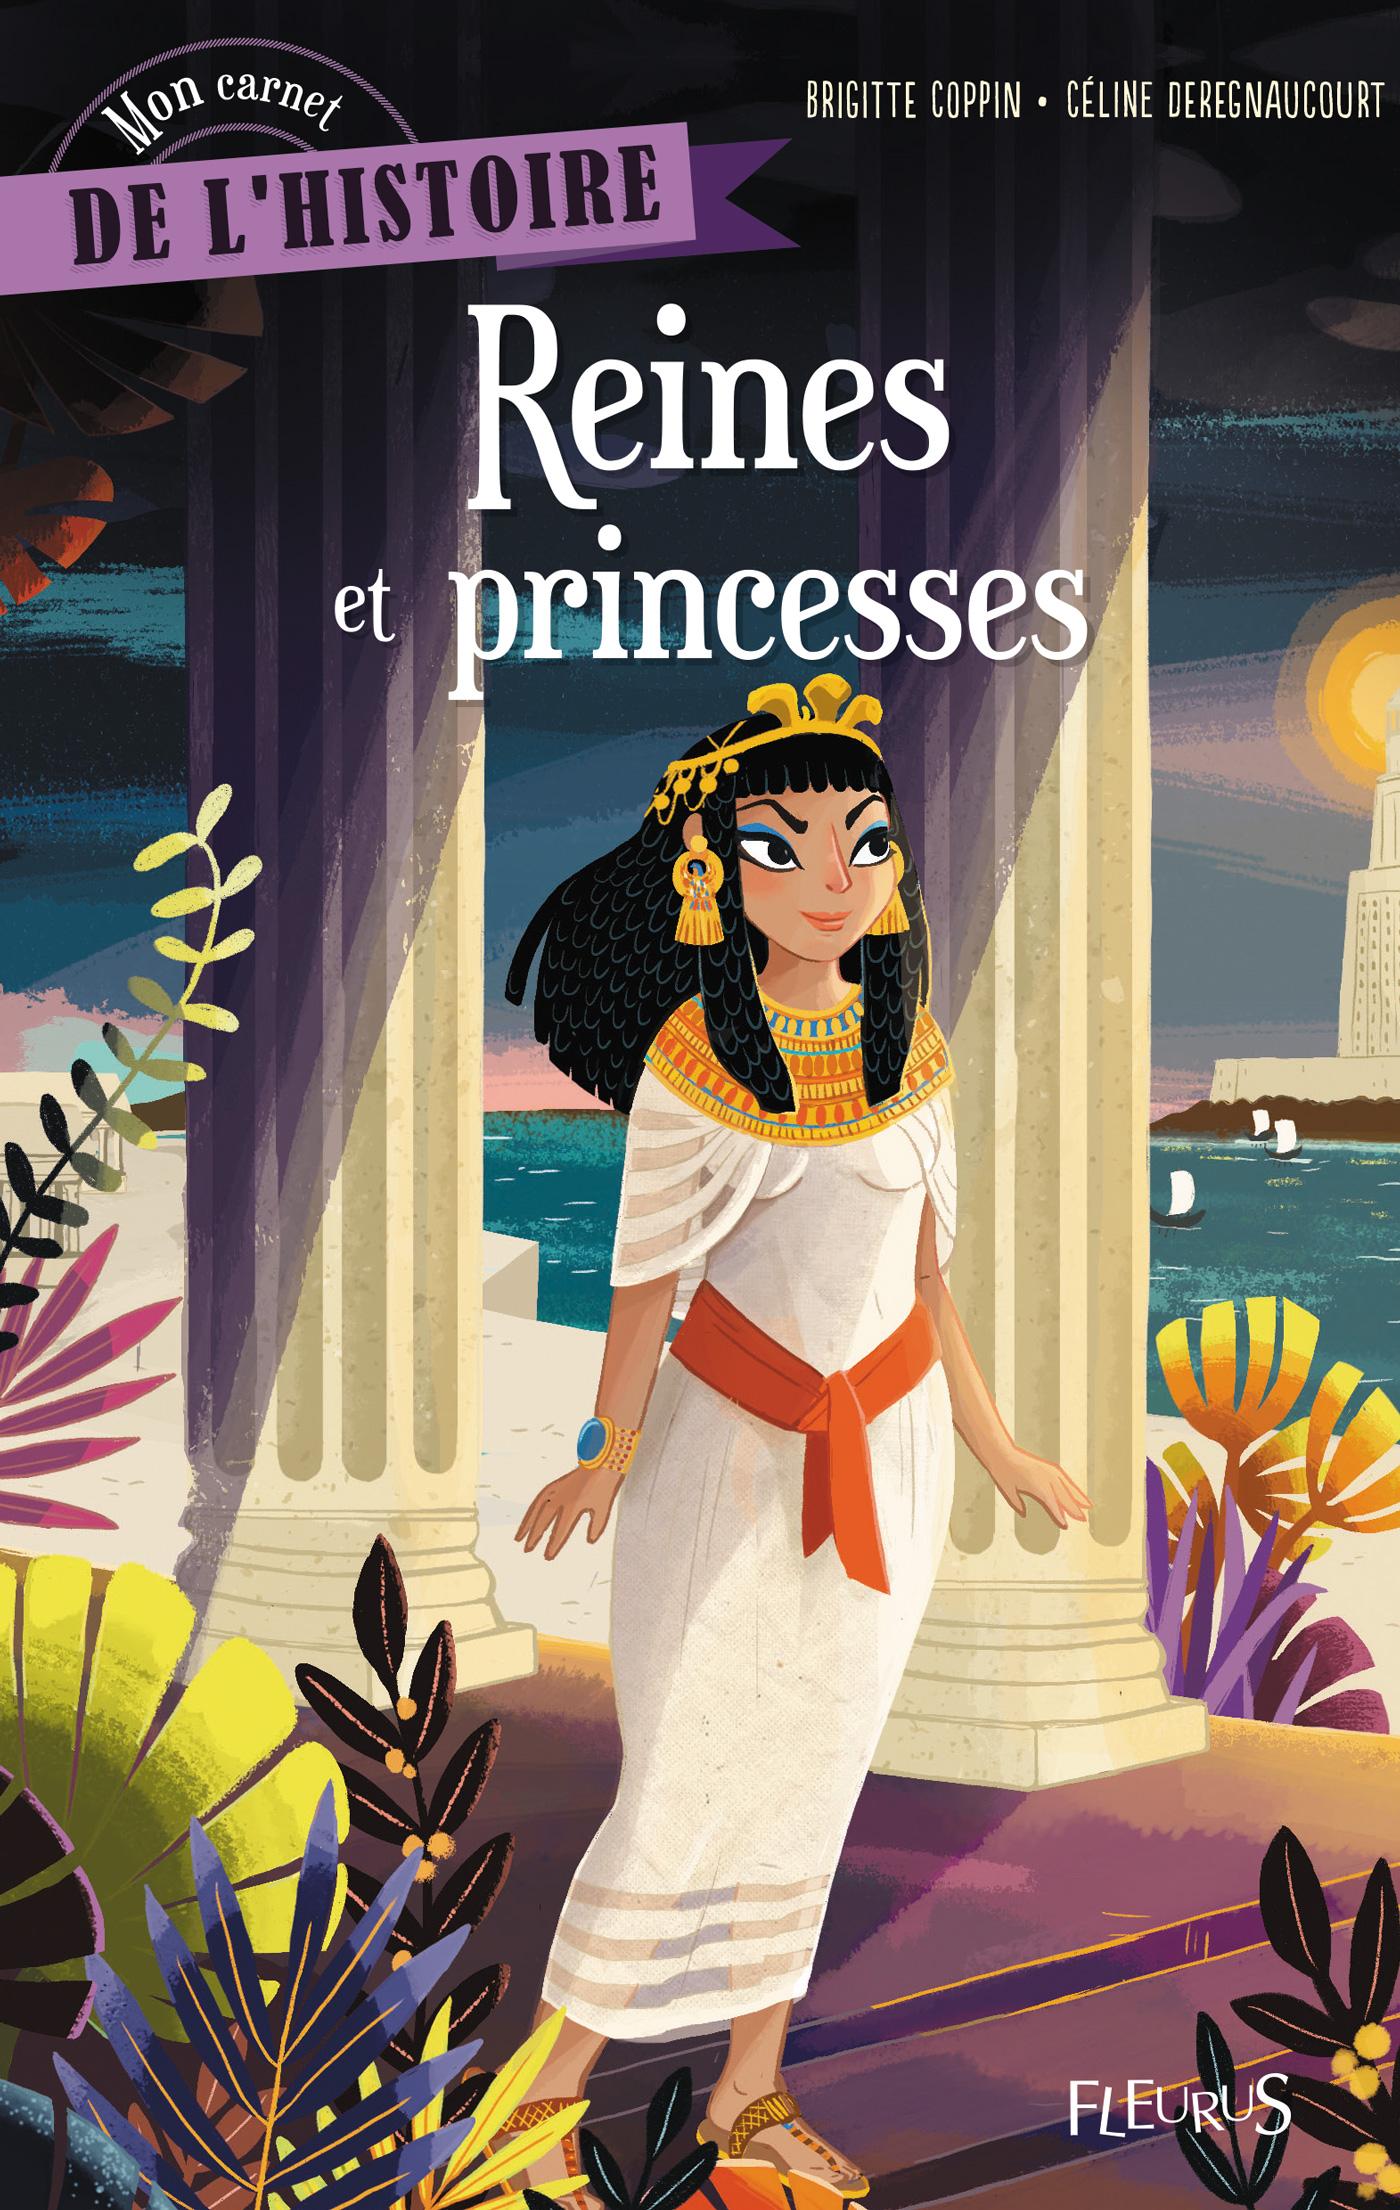 Reines et princesses